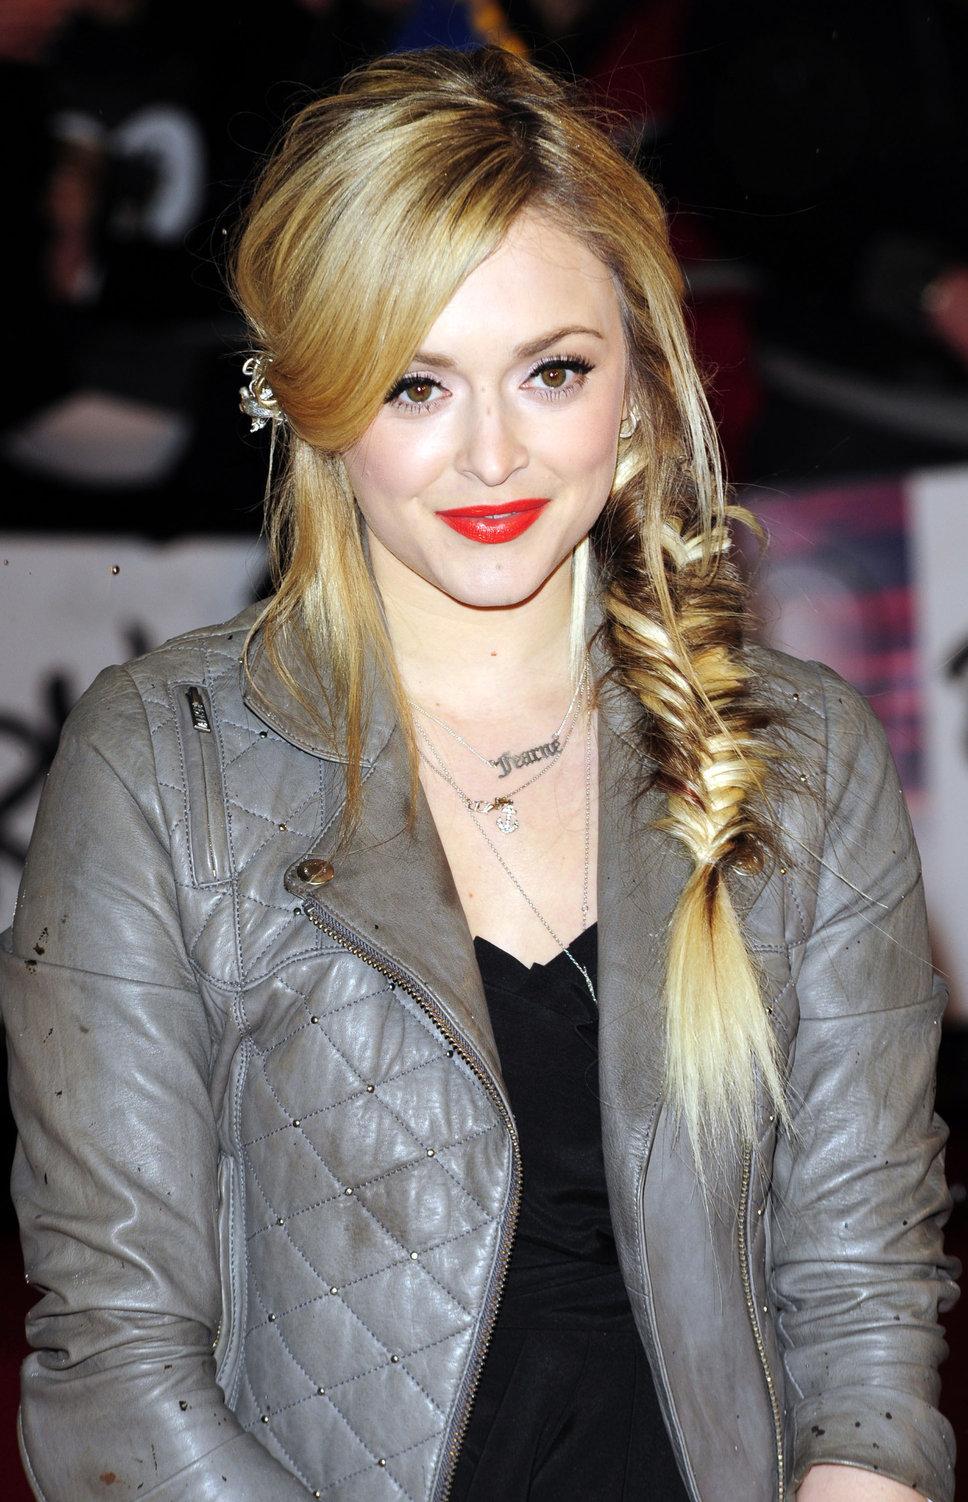 стрижки средней длины волос в кэжуал стиле с косой на бок